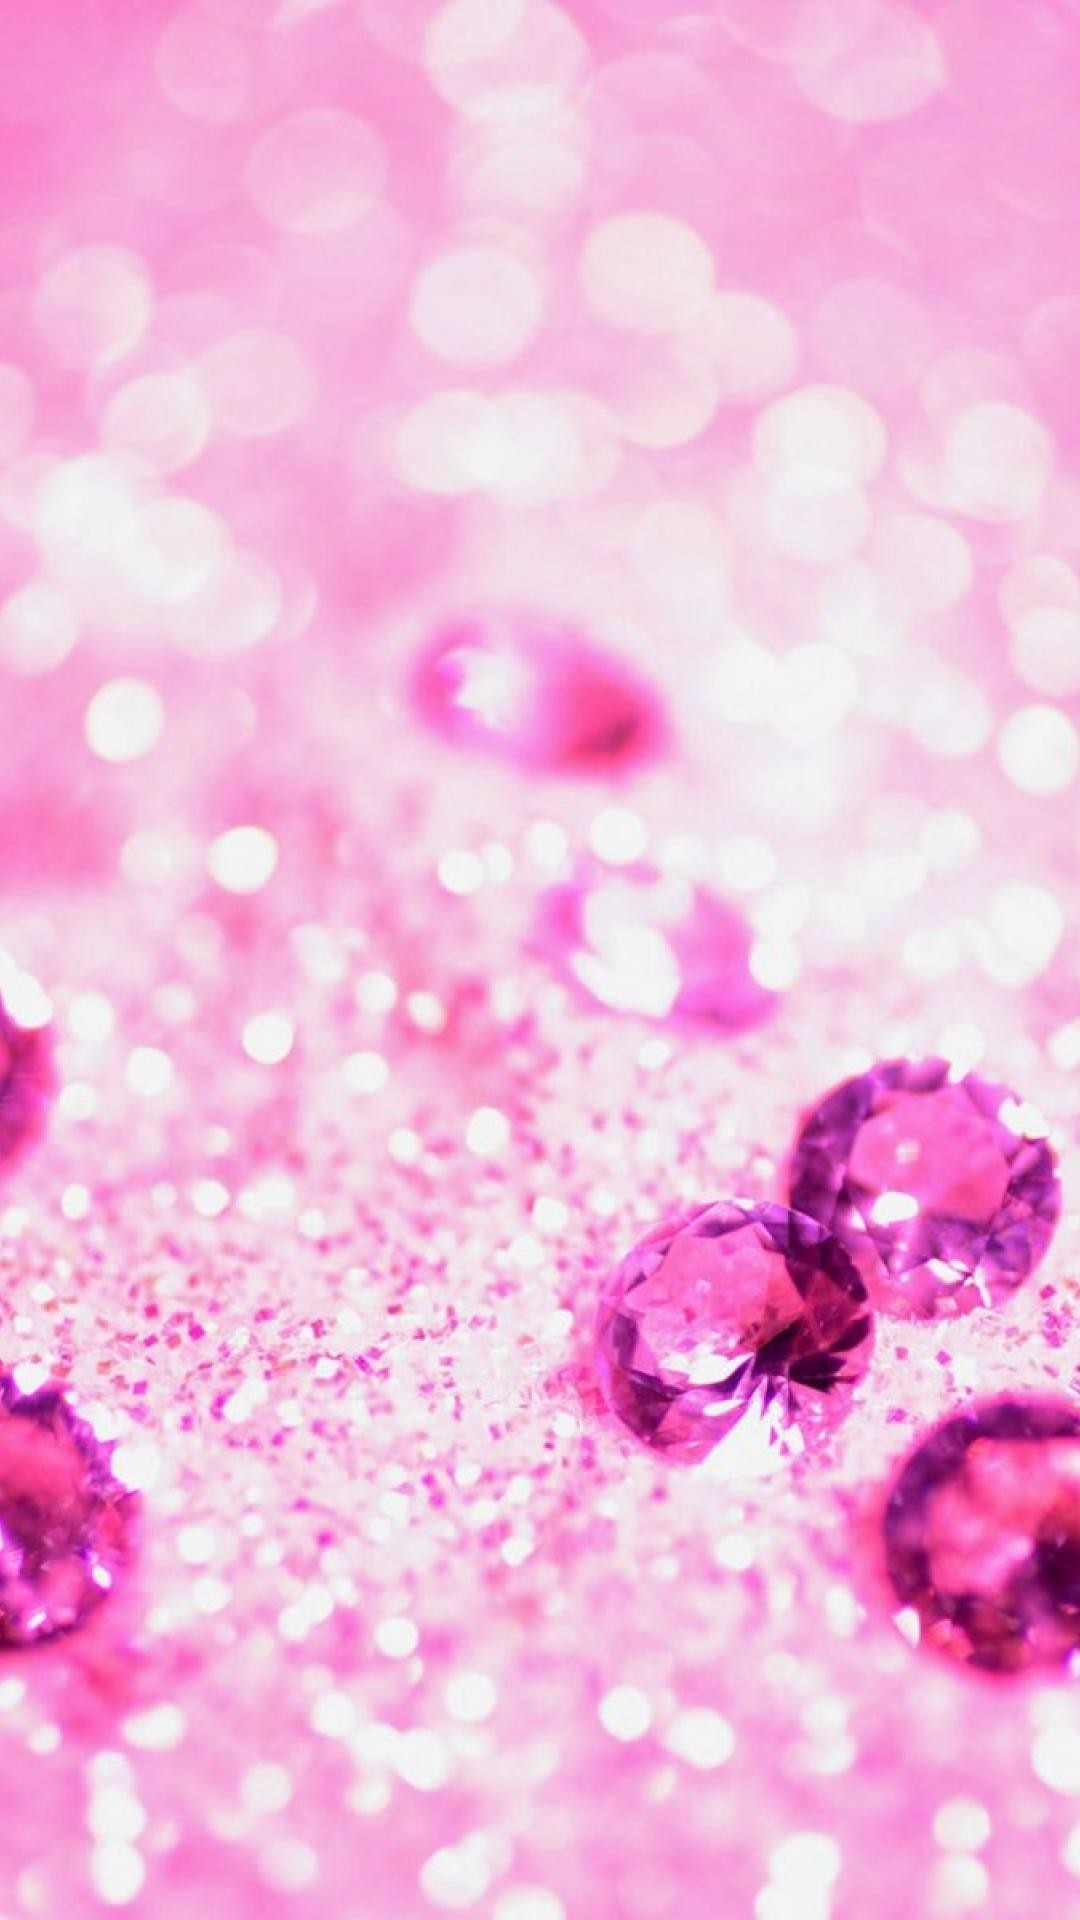 Plain Pink Wallpaper (69+ images)